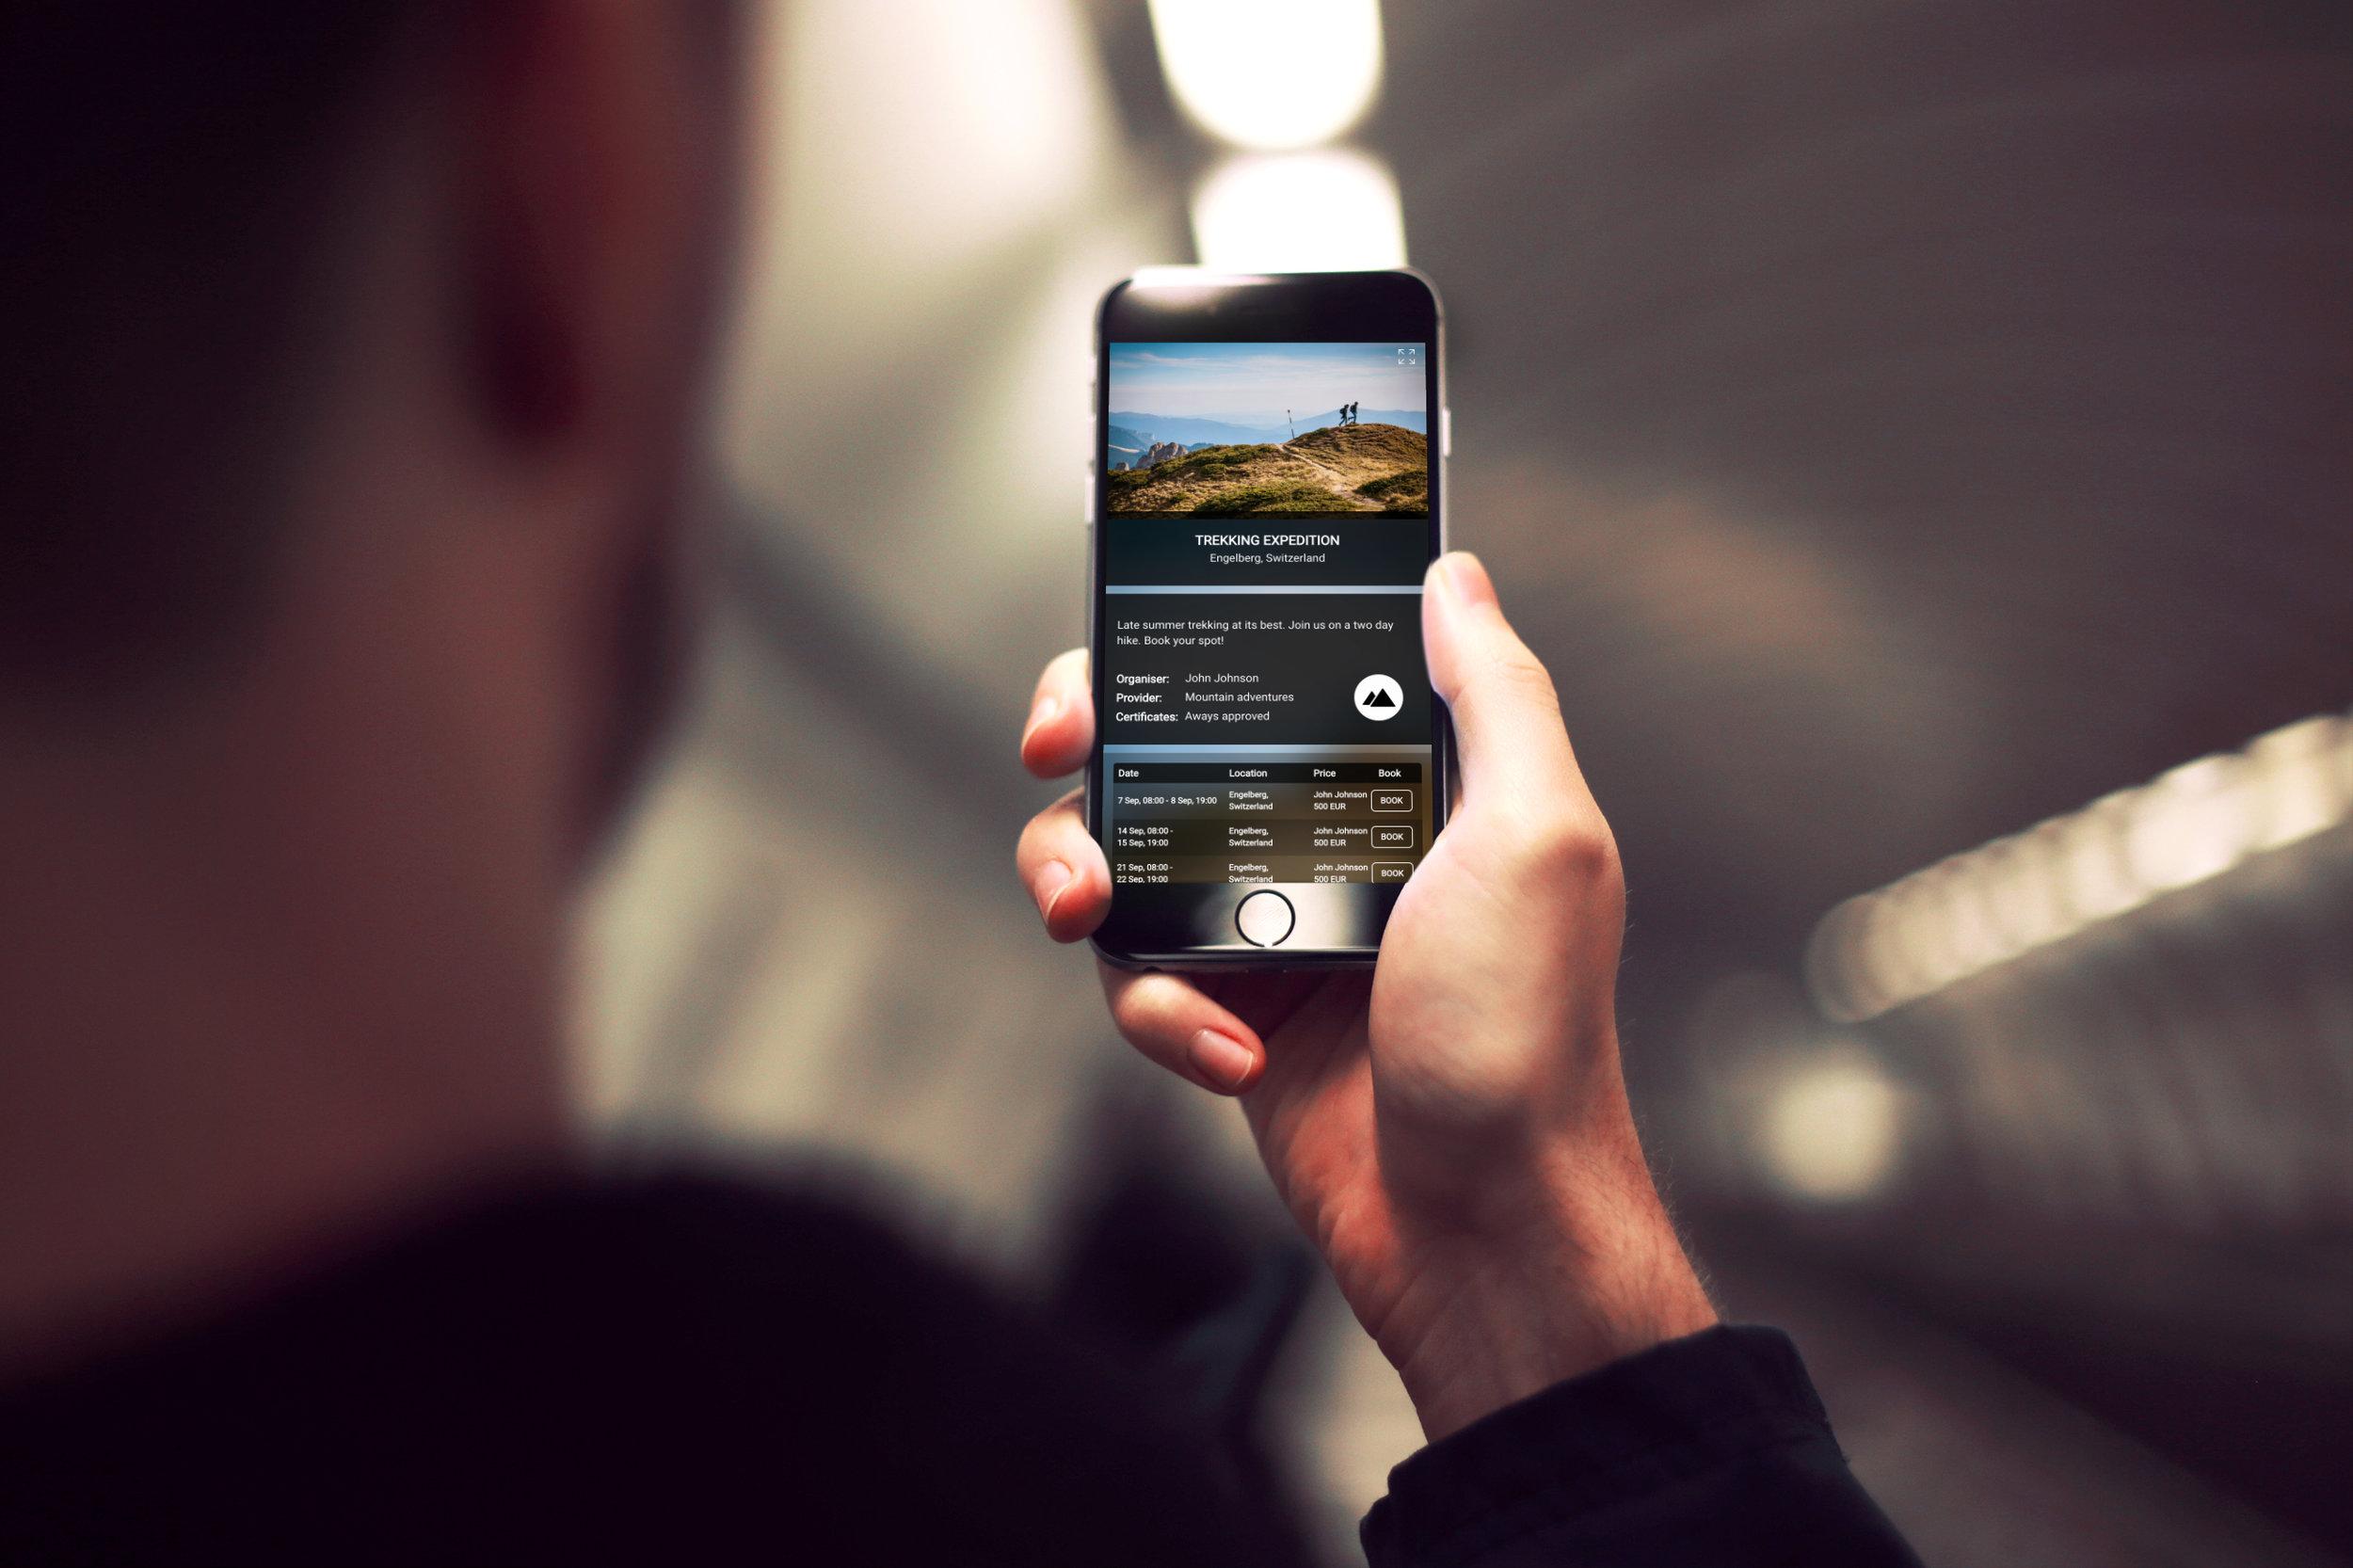 iphone-6s-in-the-underground.jpg